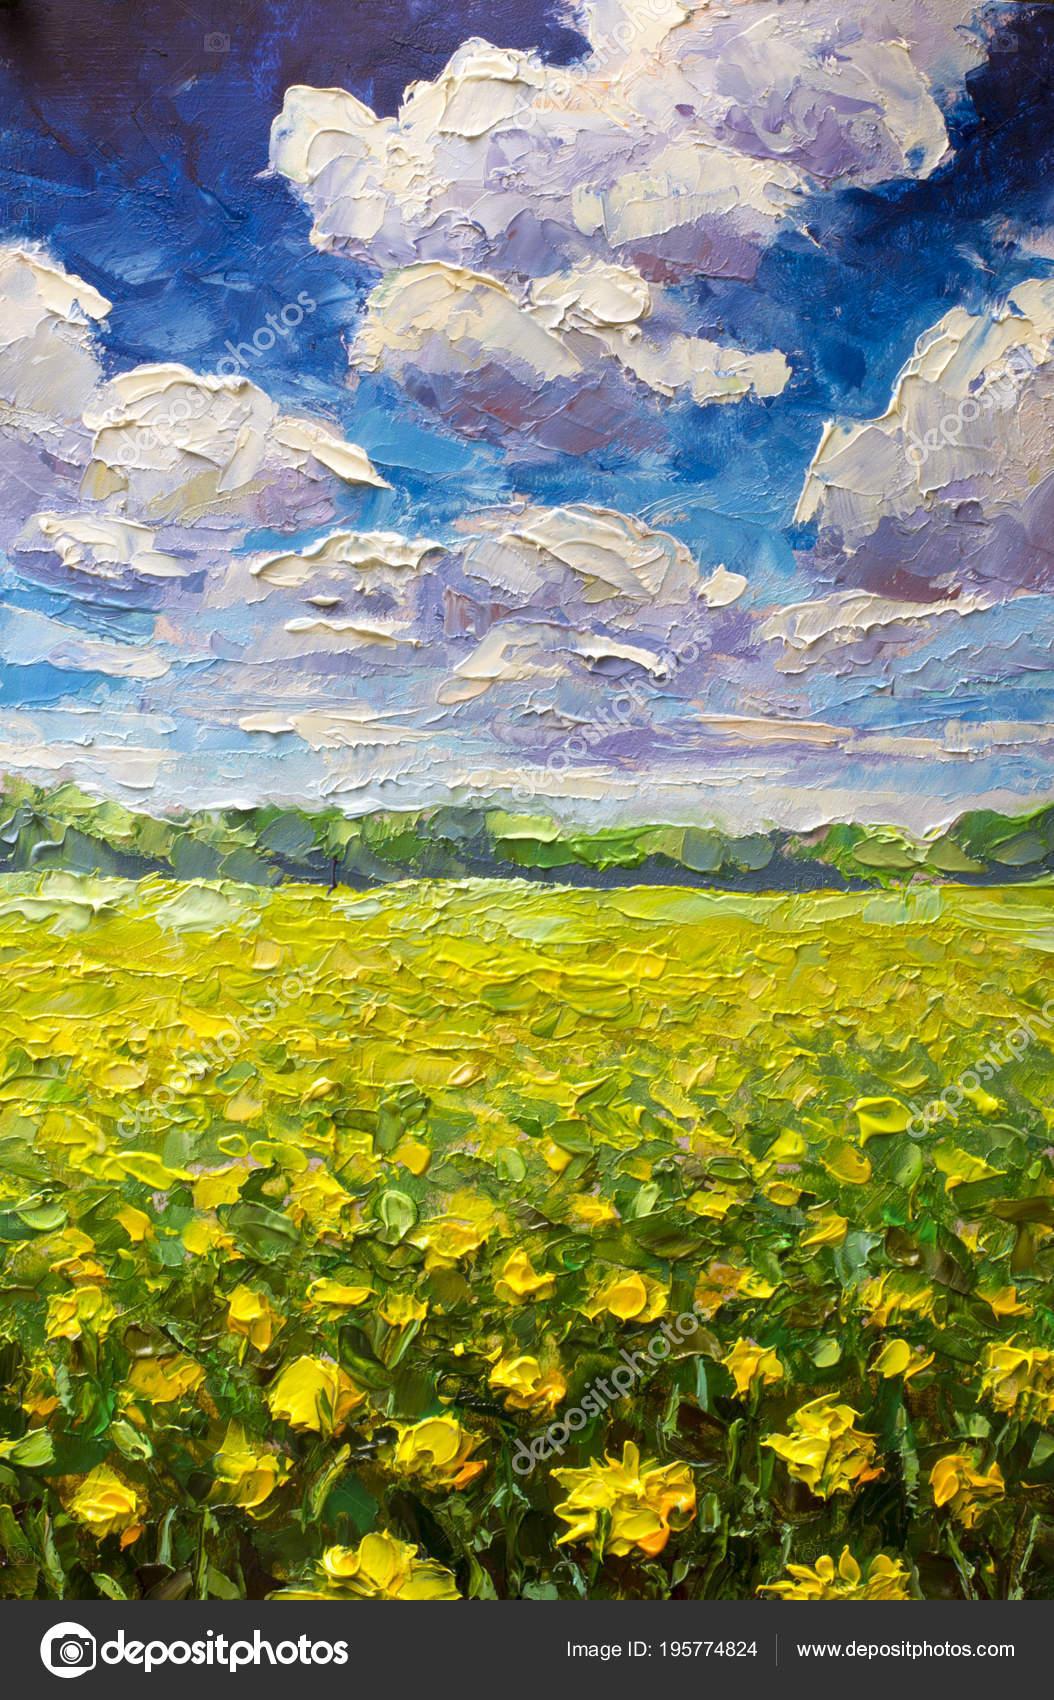 Flowers Field Painting Endless Summer Field Yellow Orange Flowers Blue Stock Photo Image By C Weris7554 195774824